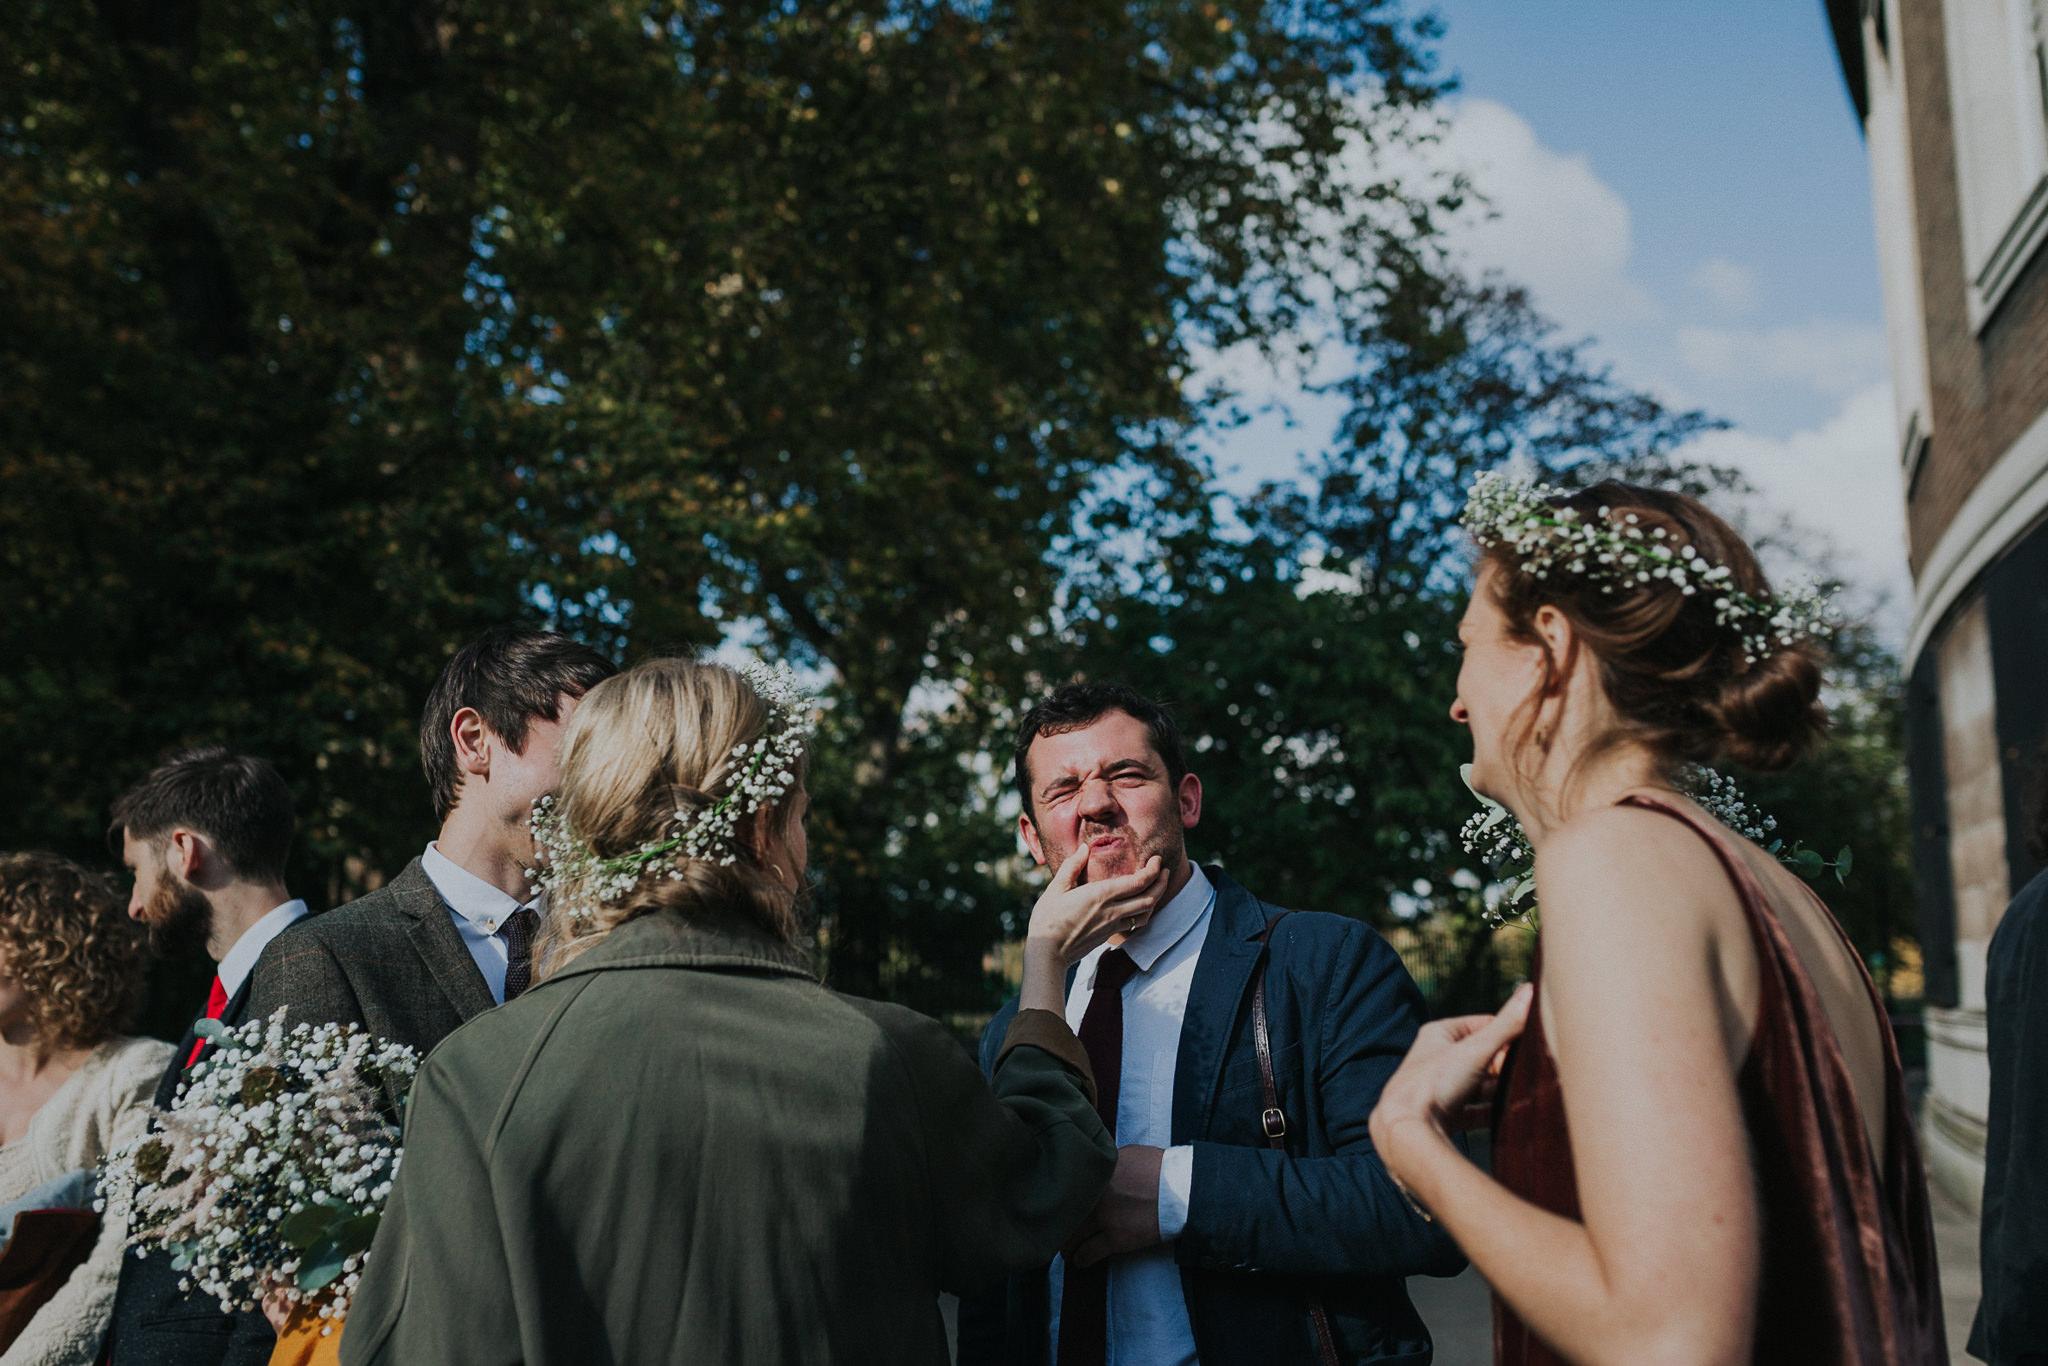 kate-gray-london-wedding-photography-33.jpg